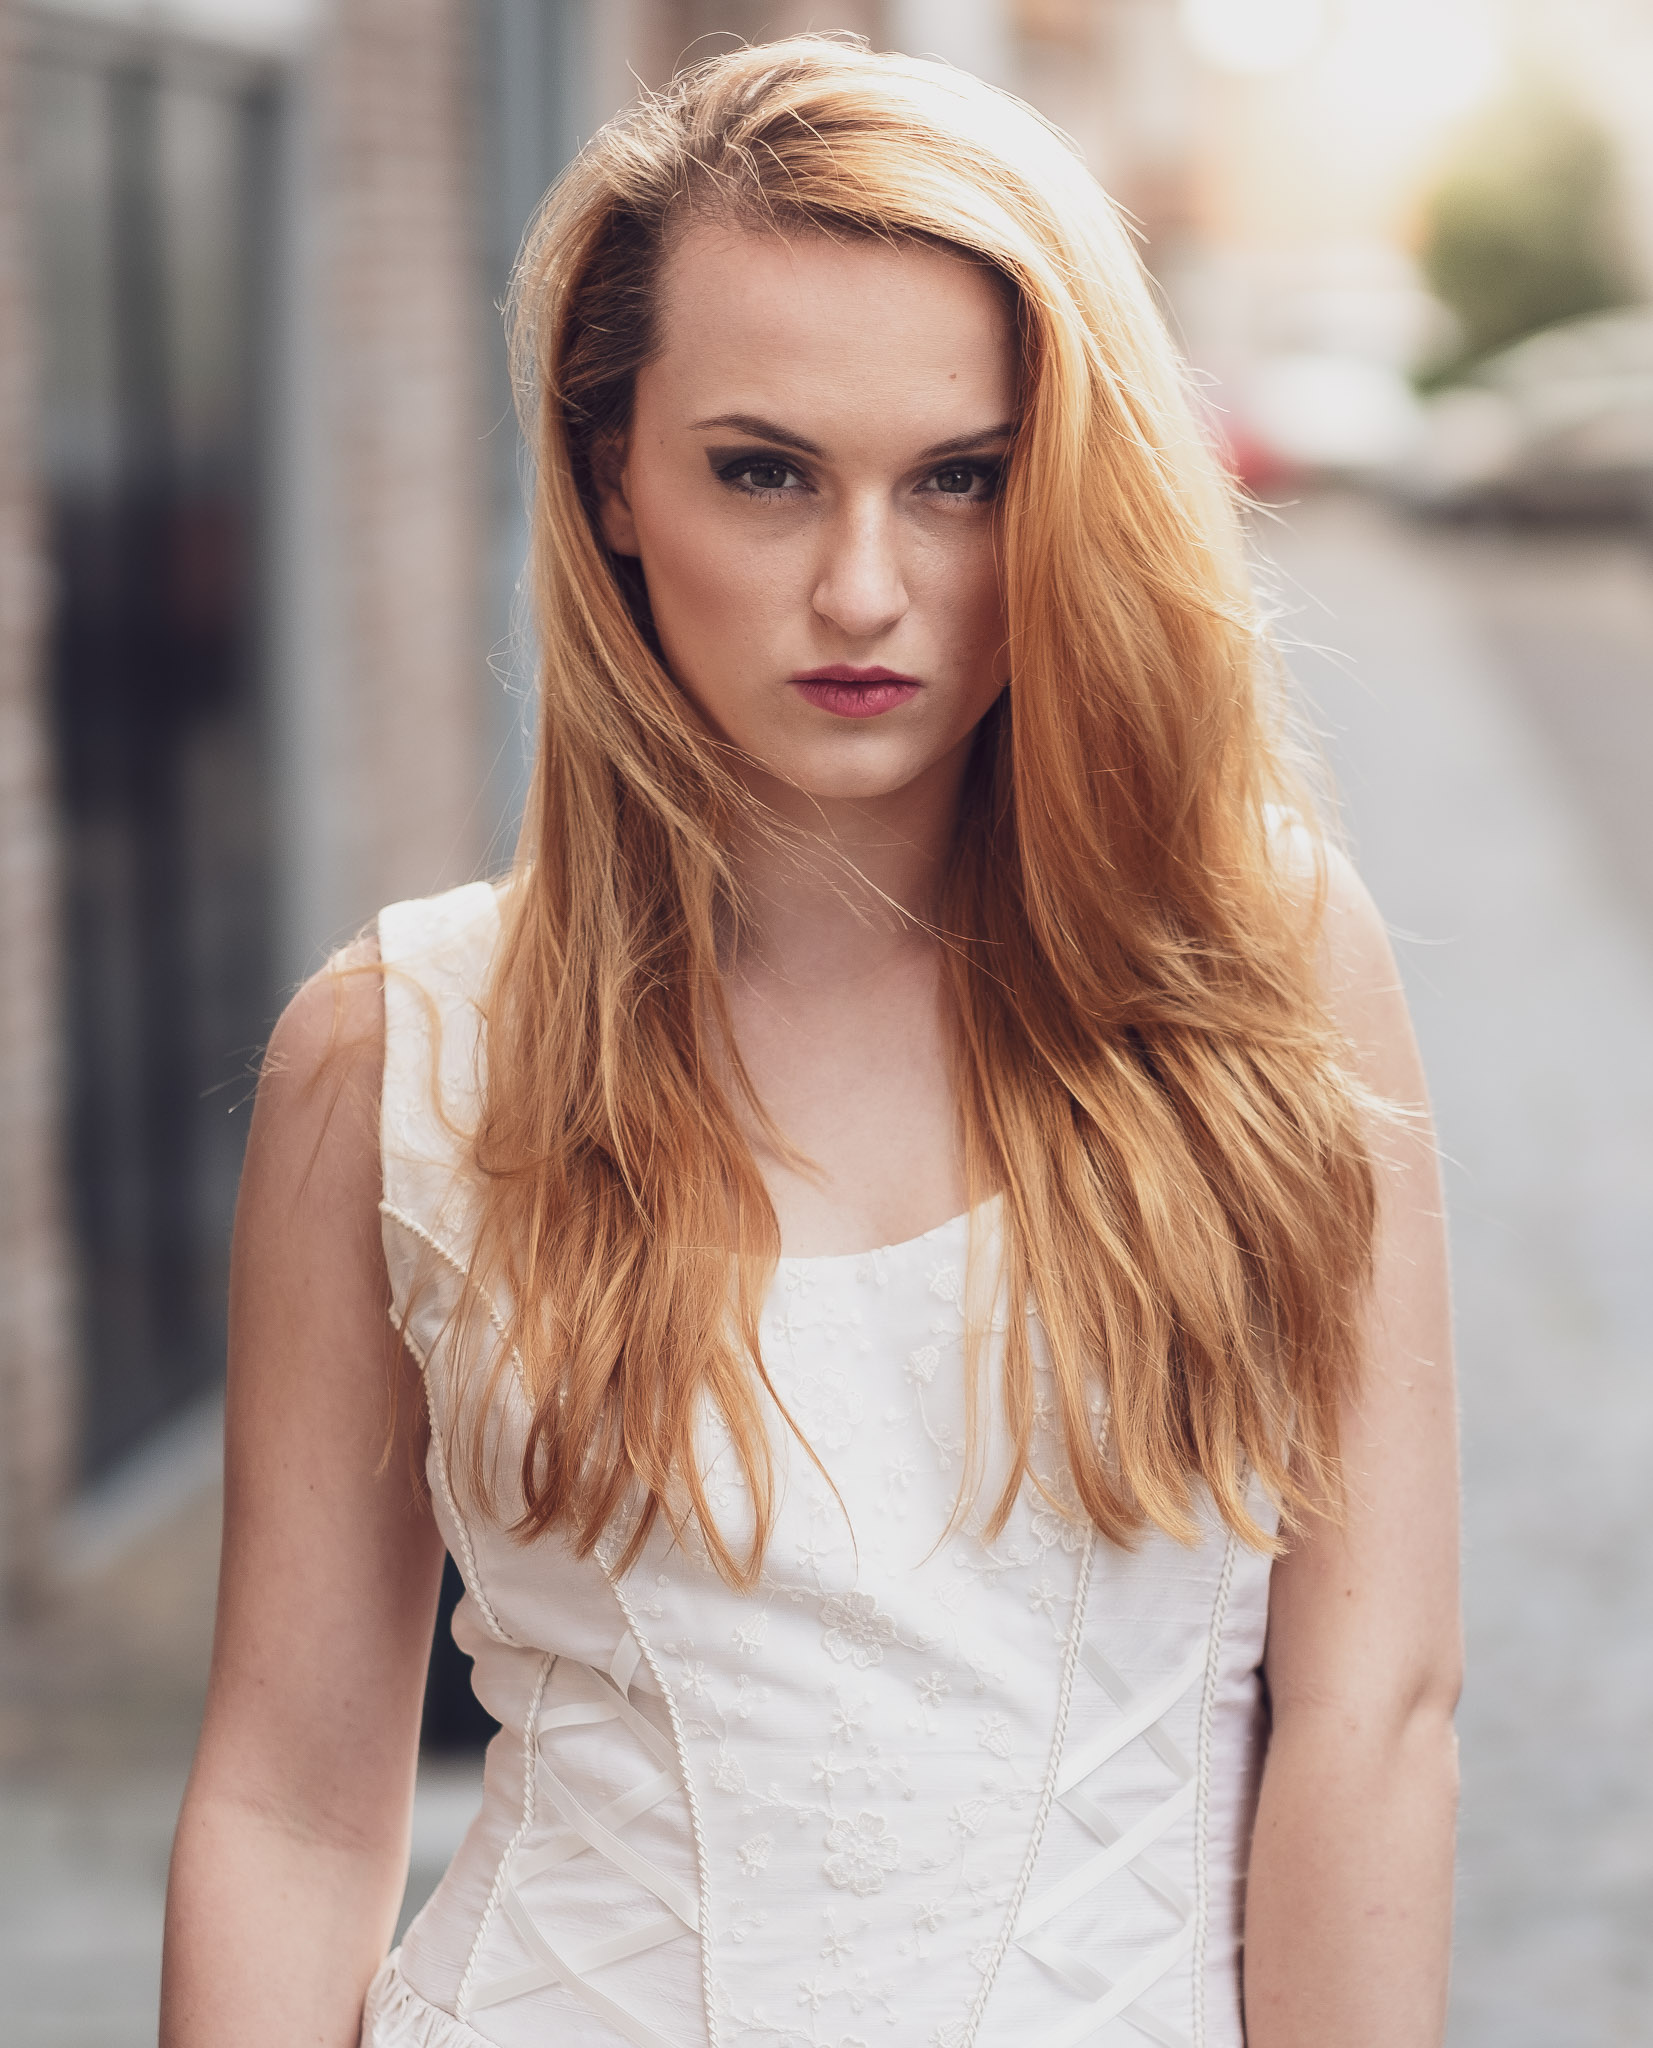 Redhead naakt model